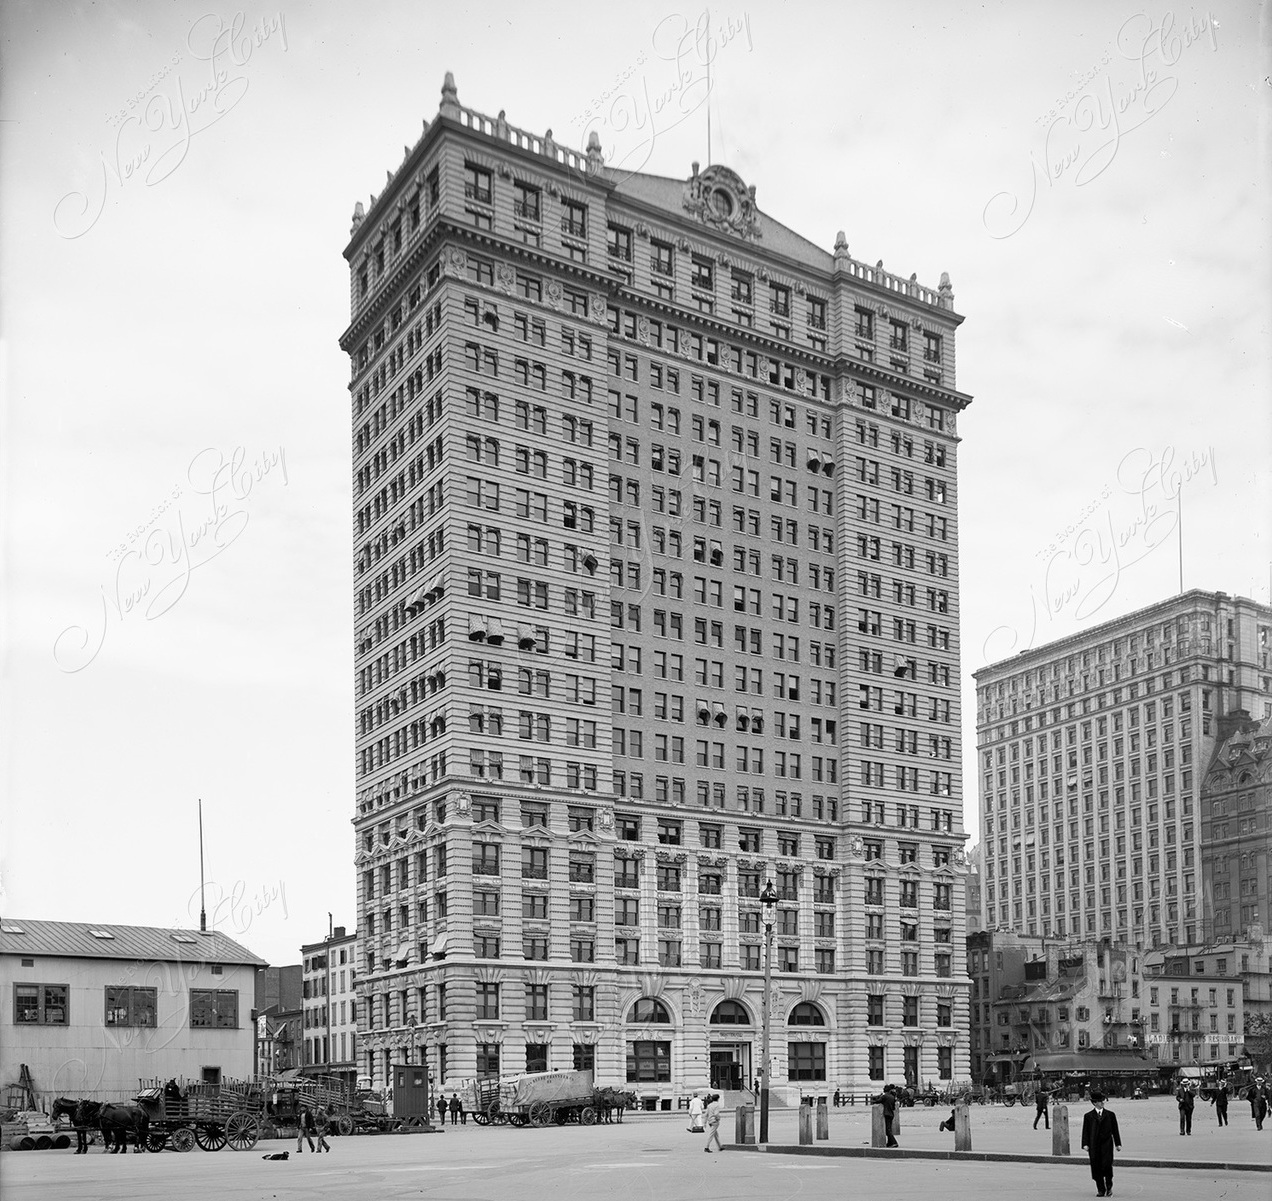 The Whitehall, 1904